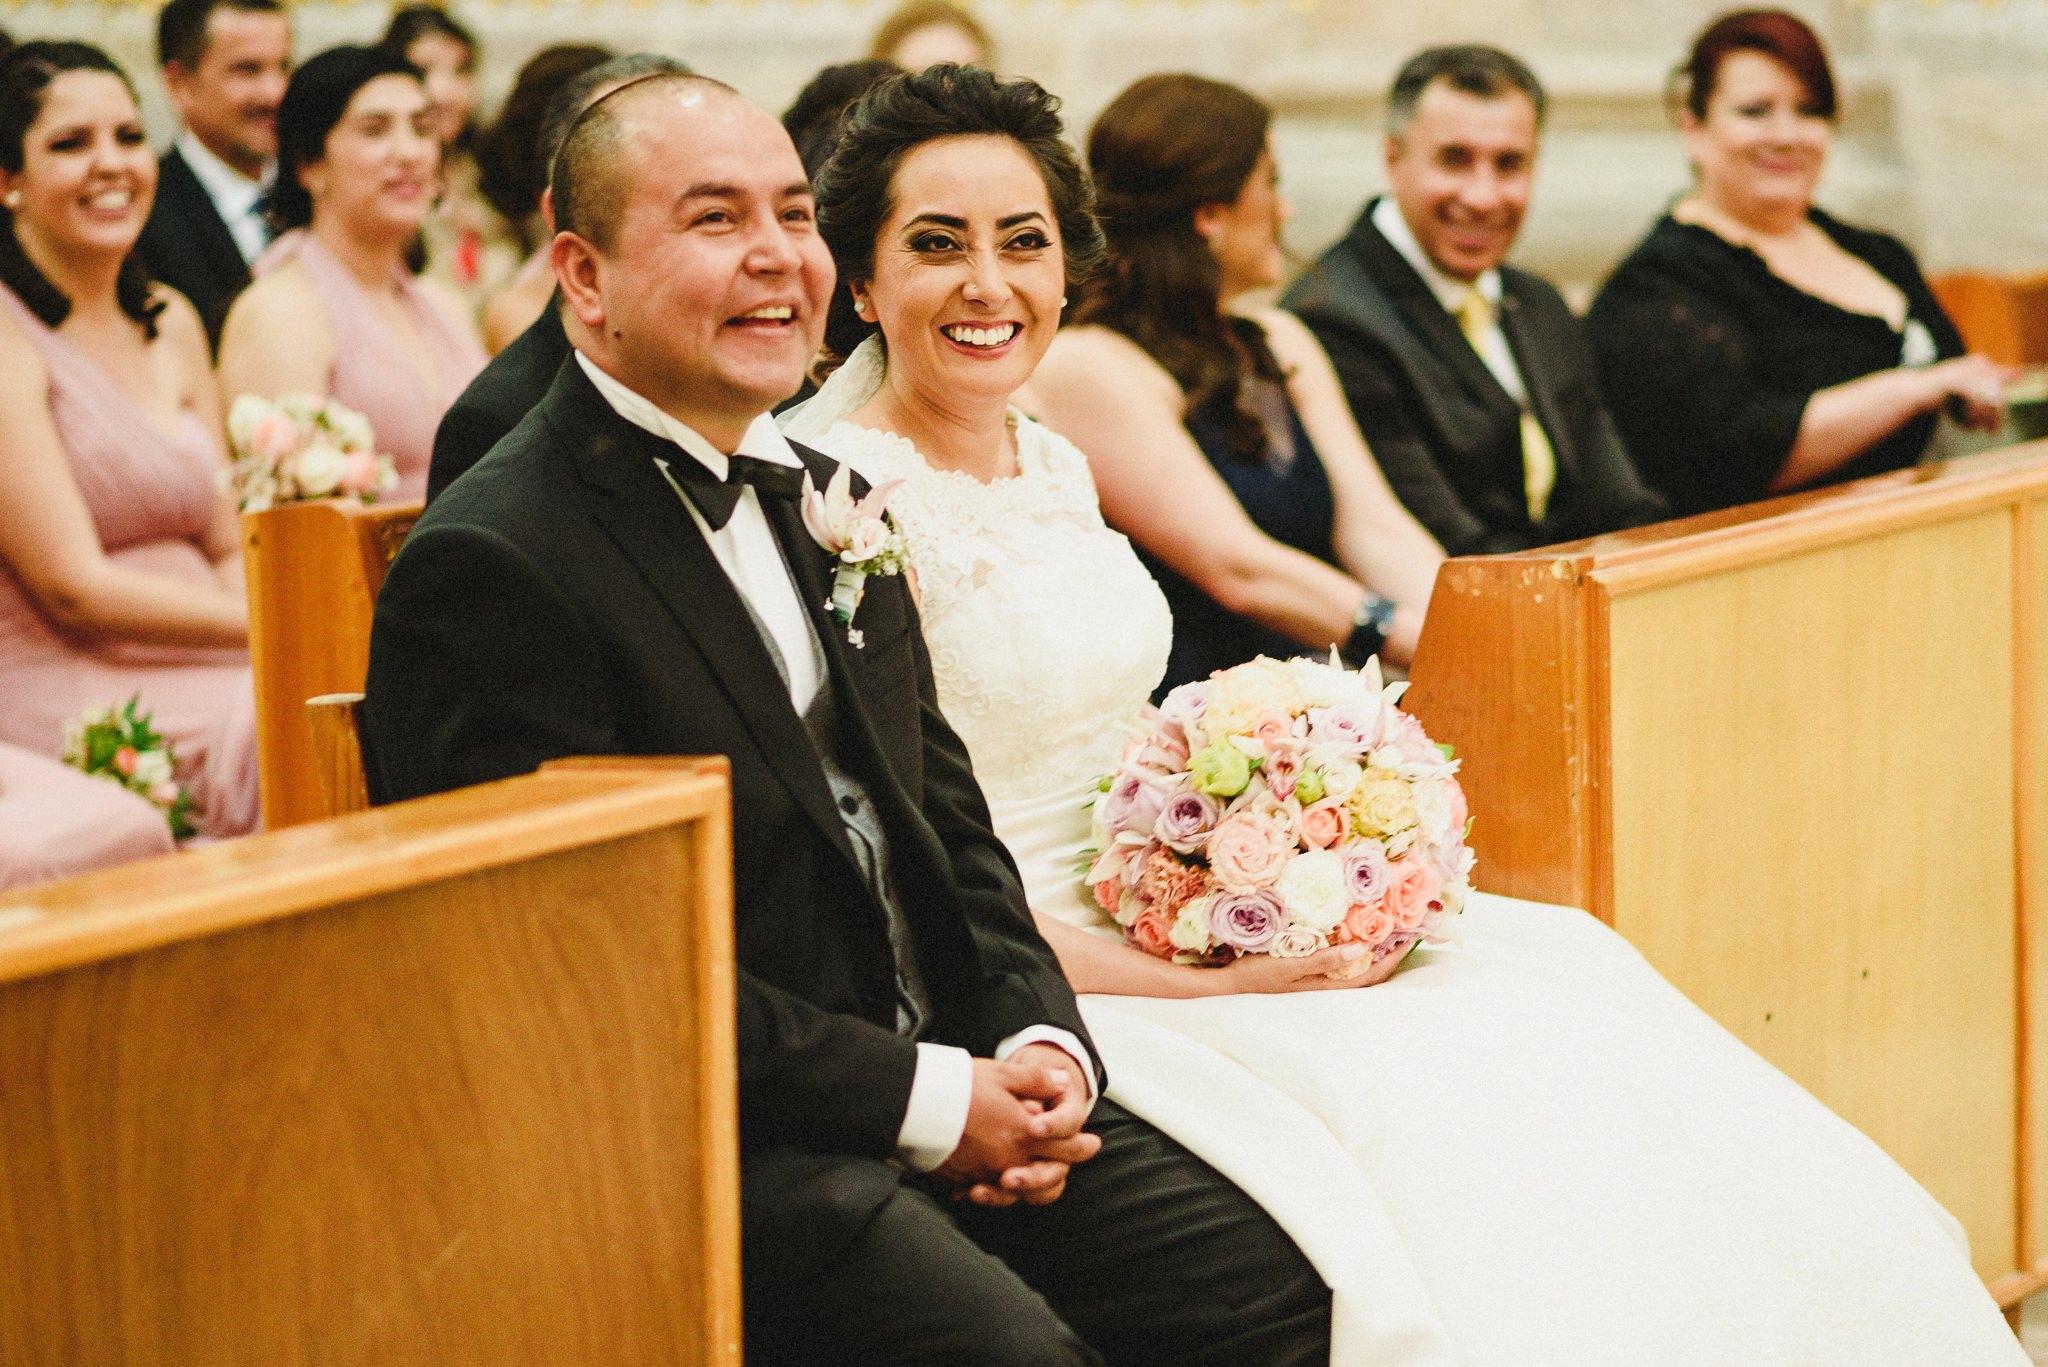 Wedding-Boda-Tulancingo-Hidalgo-Salon-Essenzia-Luis-Houdin-23-film